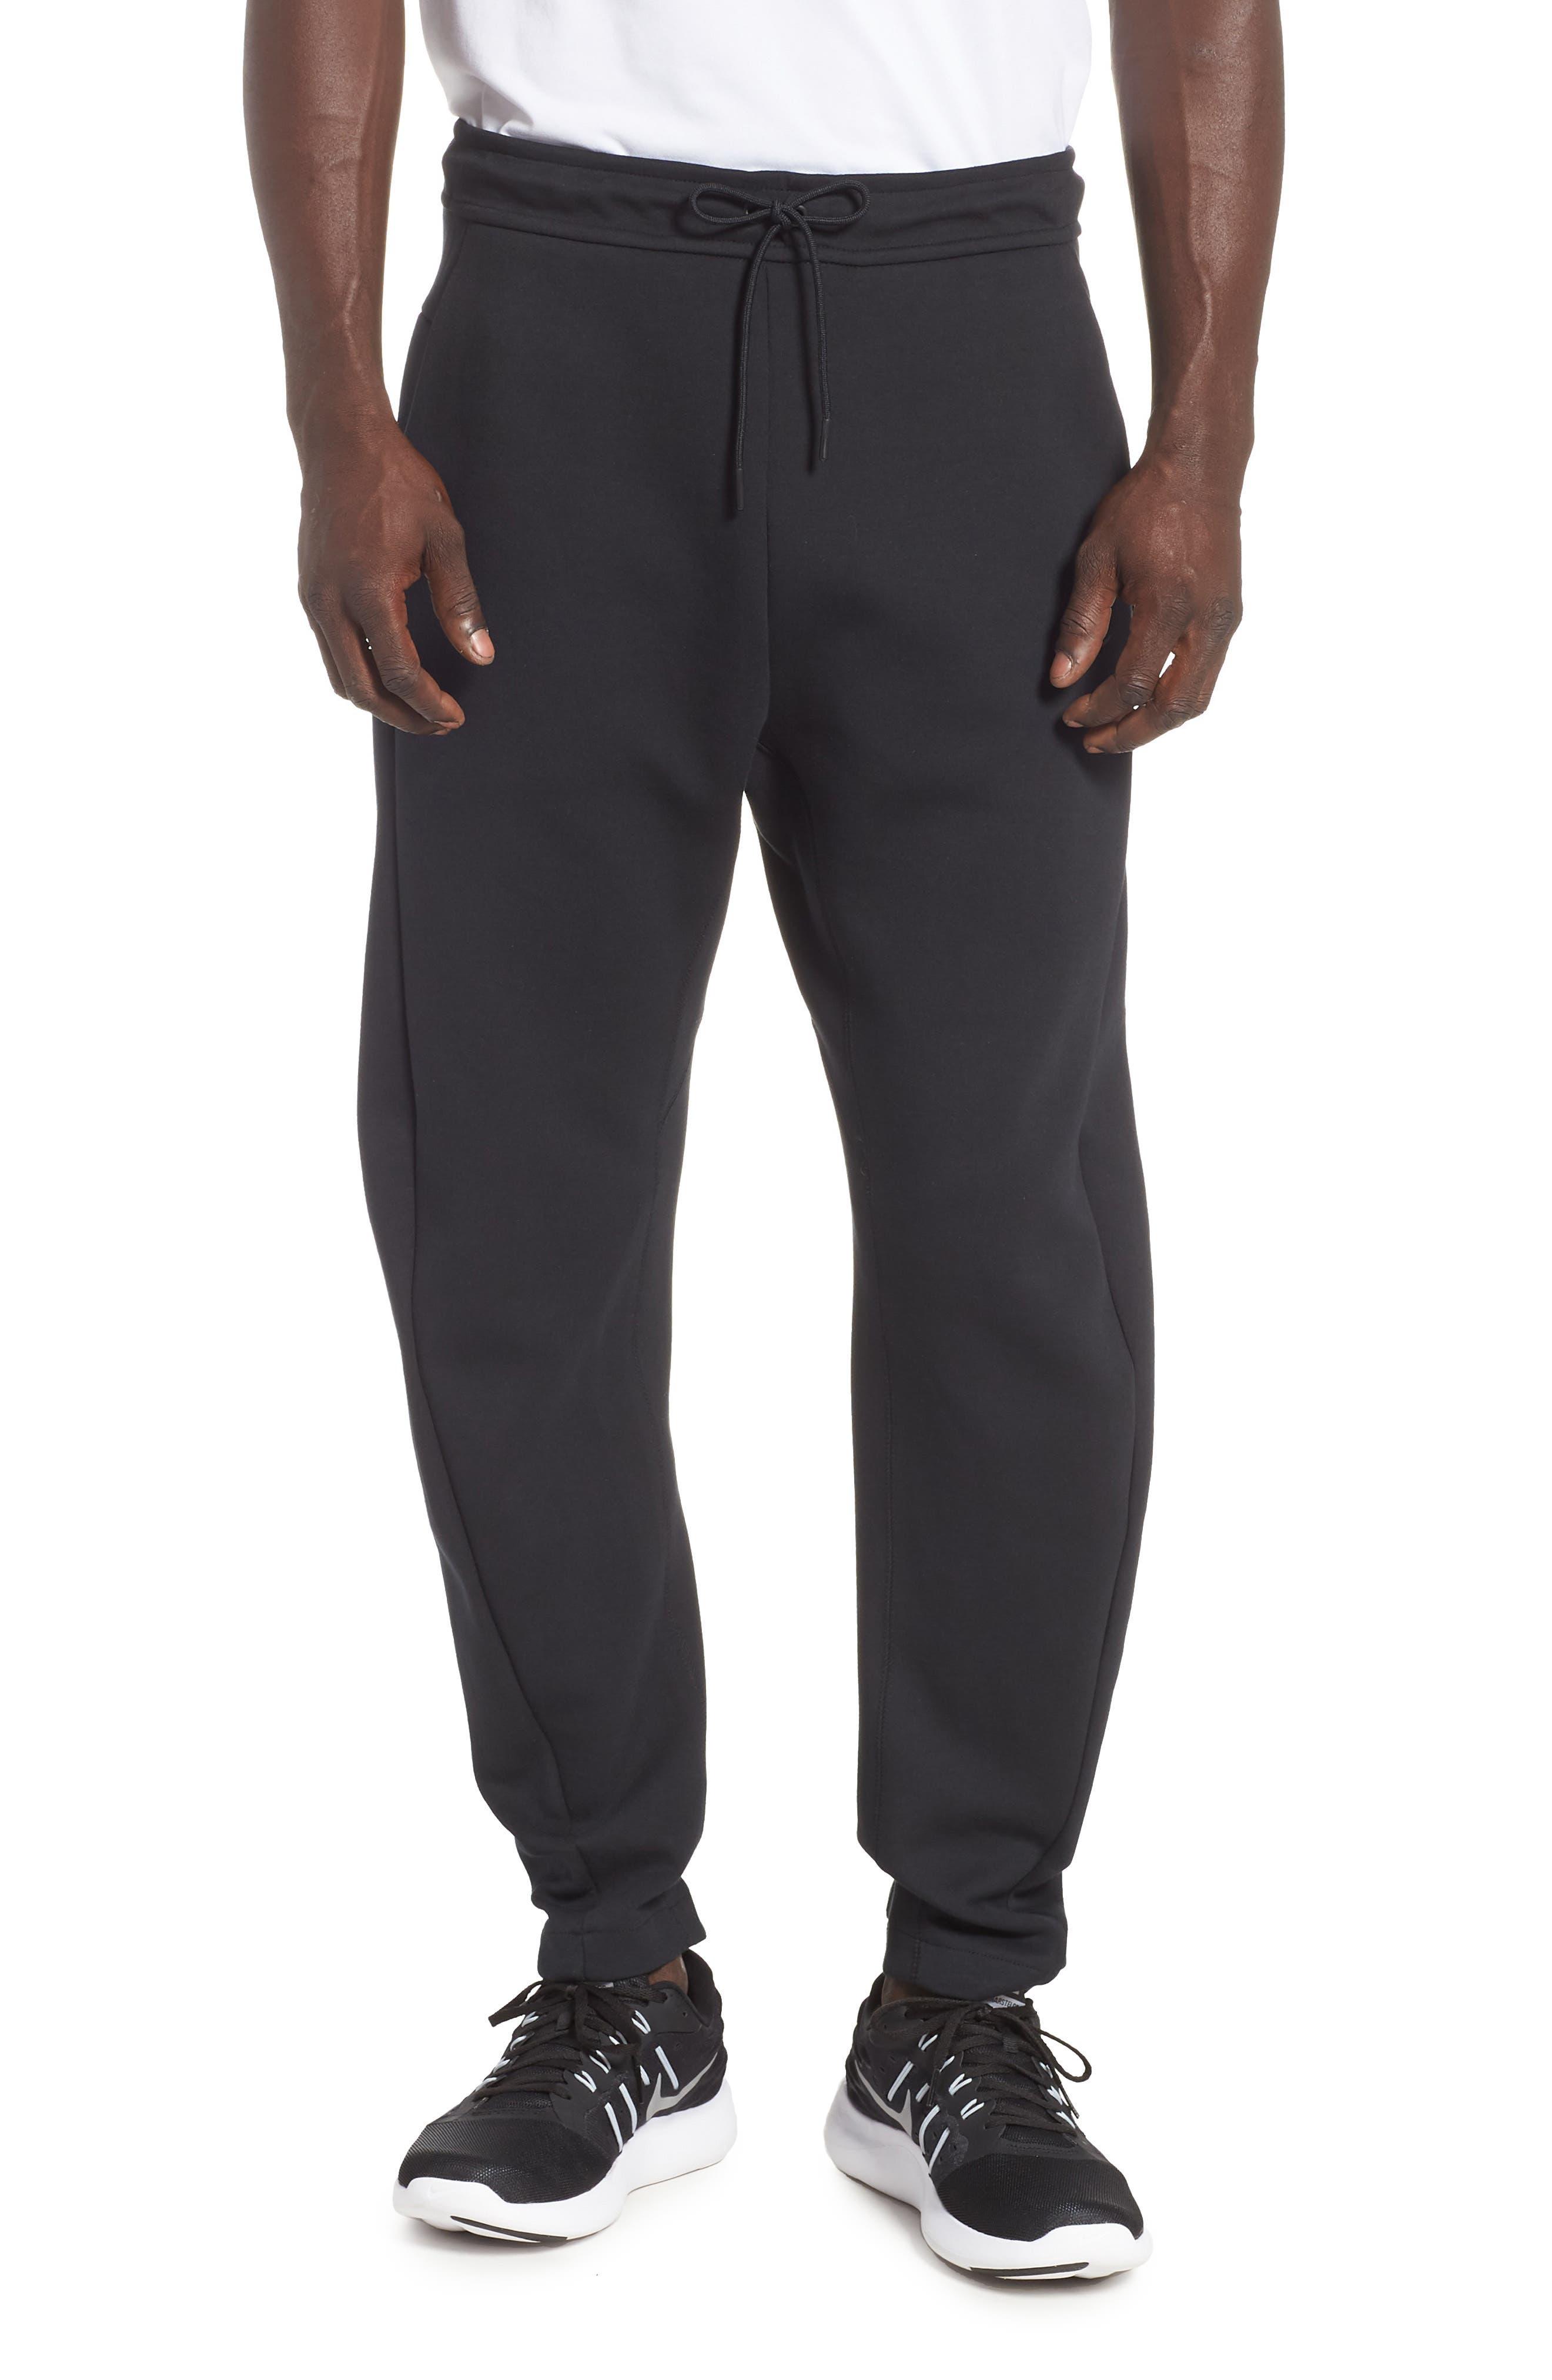 Tech Fleece Pants,                         Main,                         color, BLACK/ BLACK